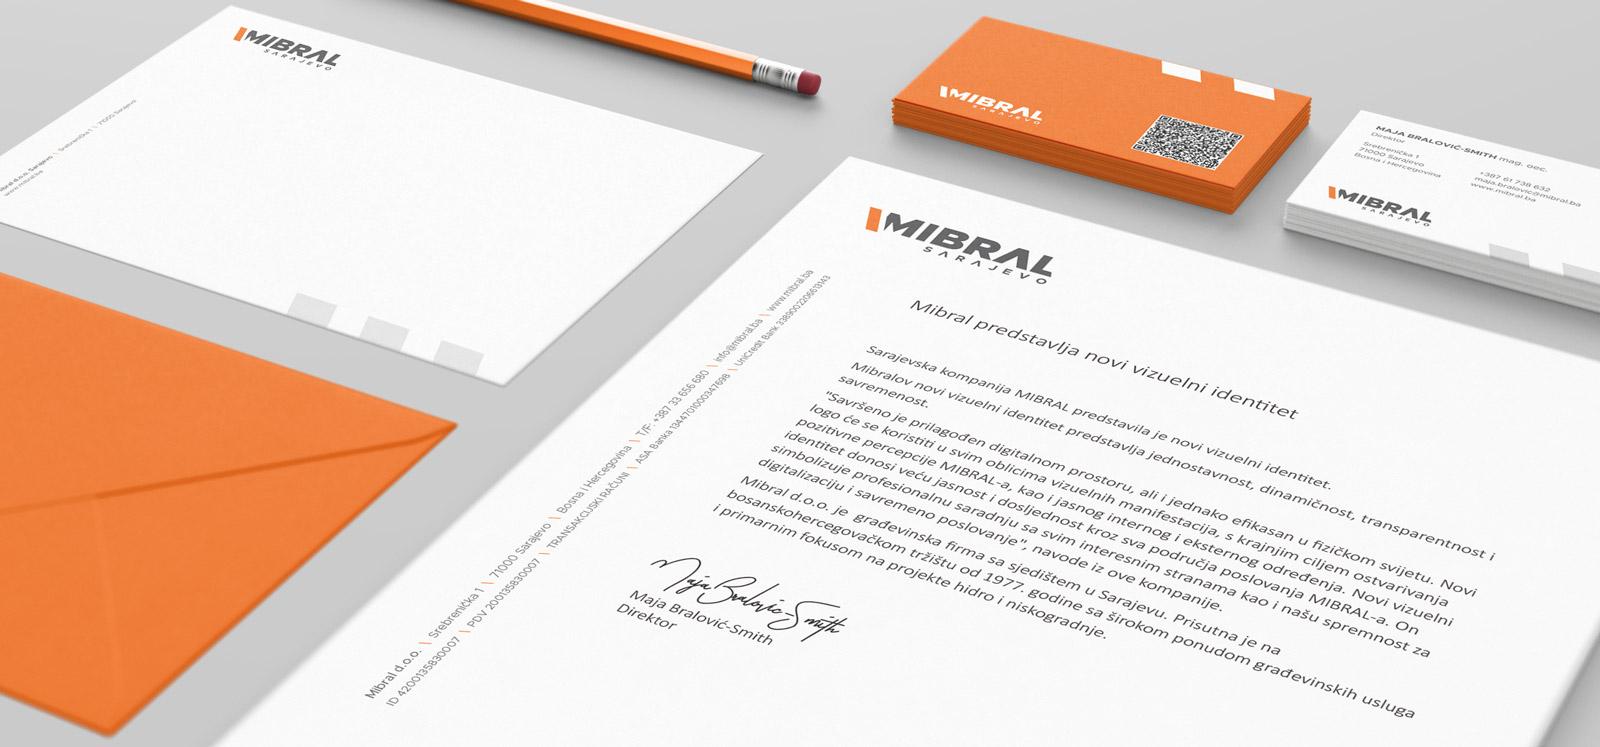 Mibral Visual identity 2020